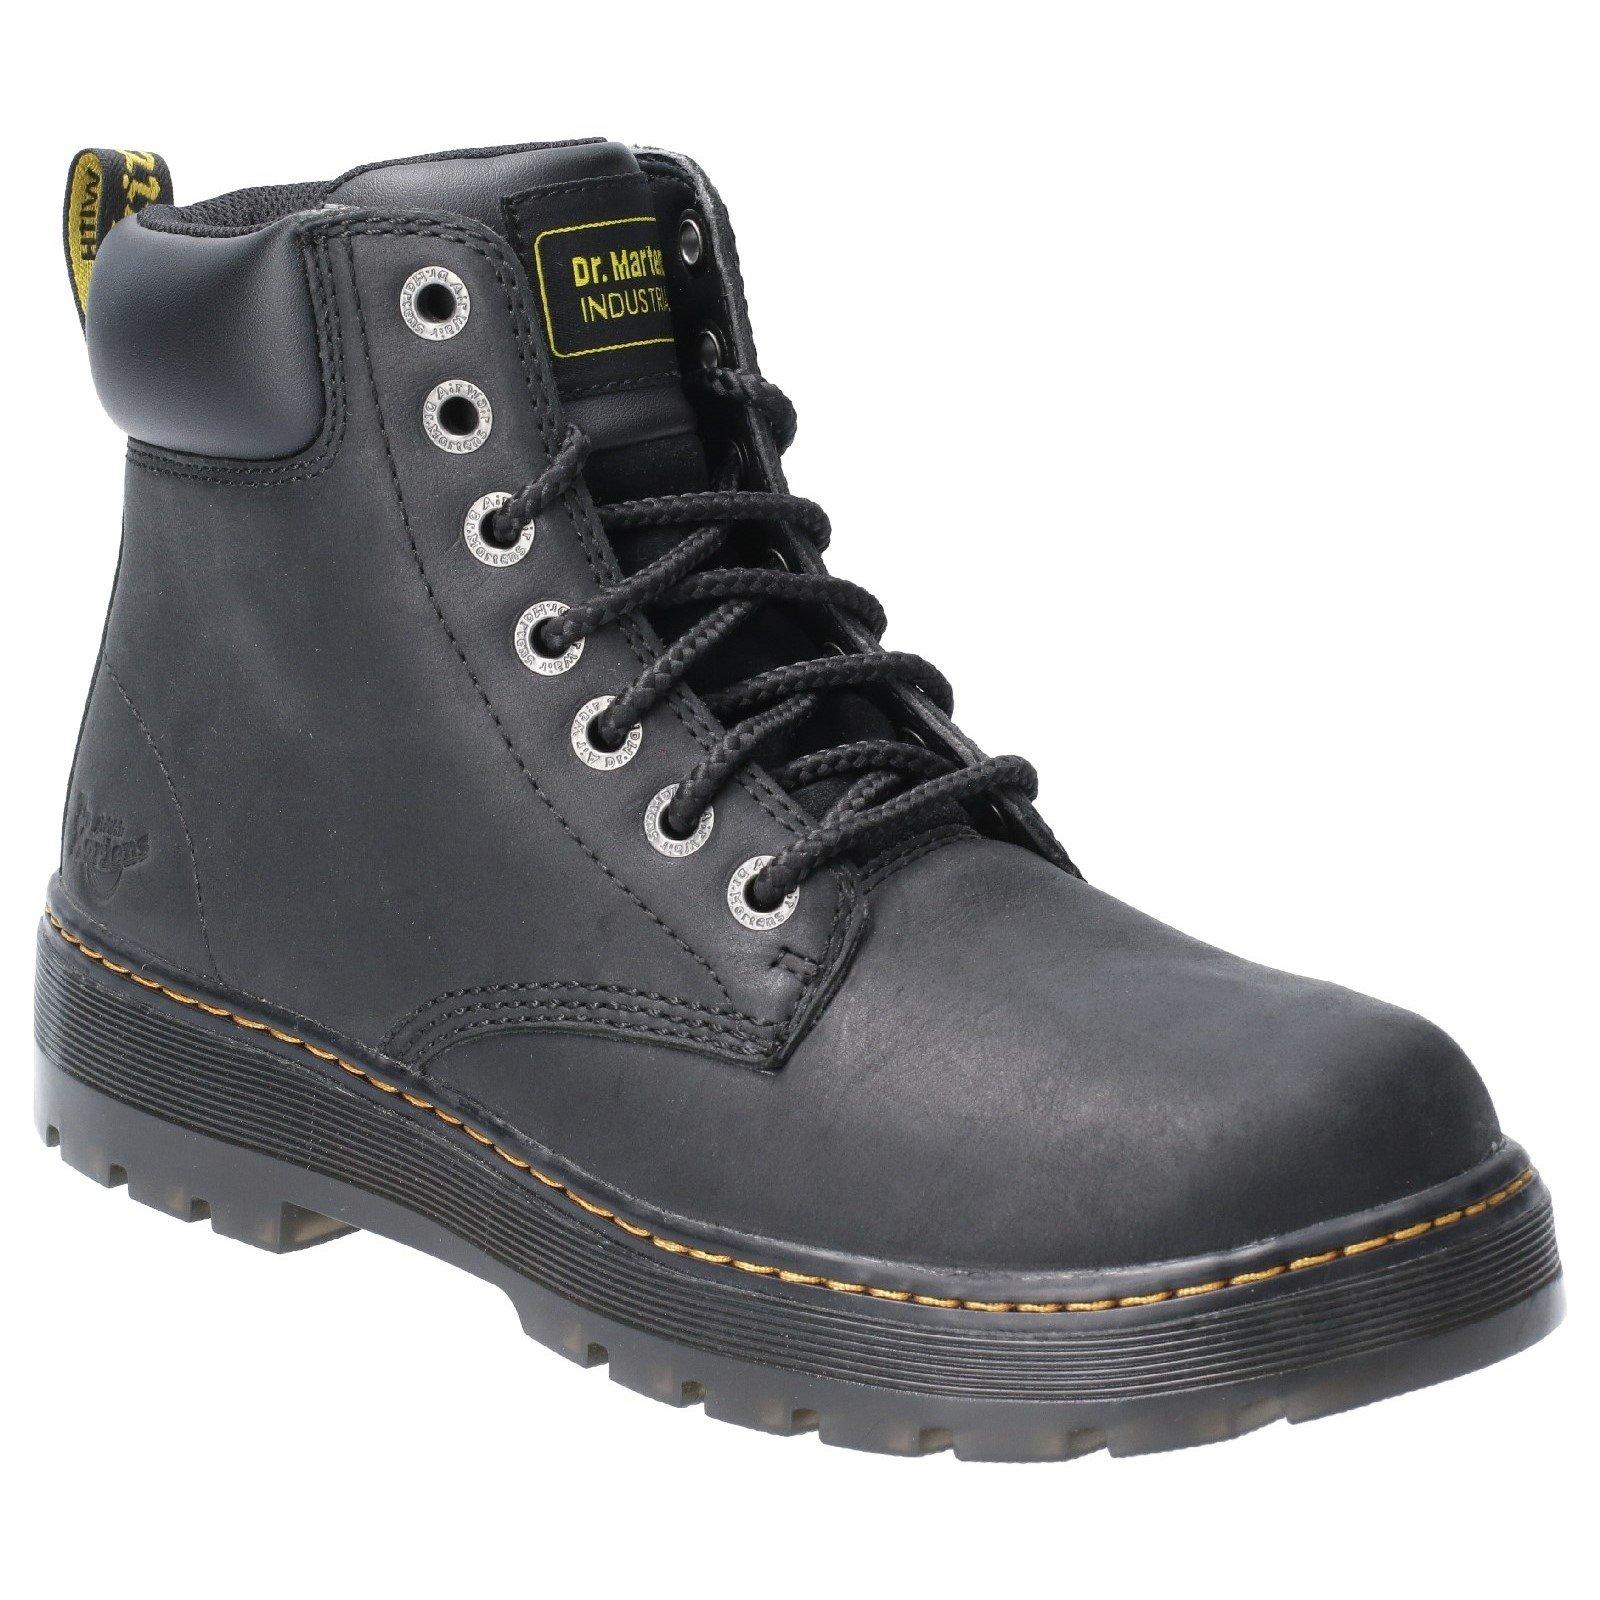 Dr Martens Men's Winch Non-Safety Work Boot Black 29821 - Black 12